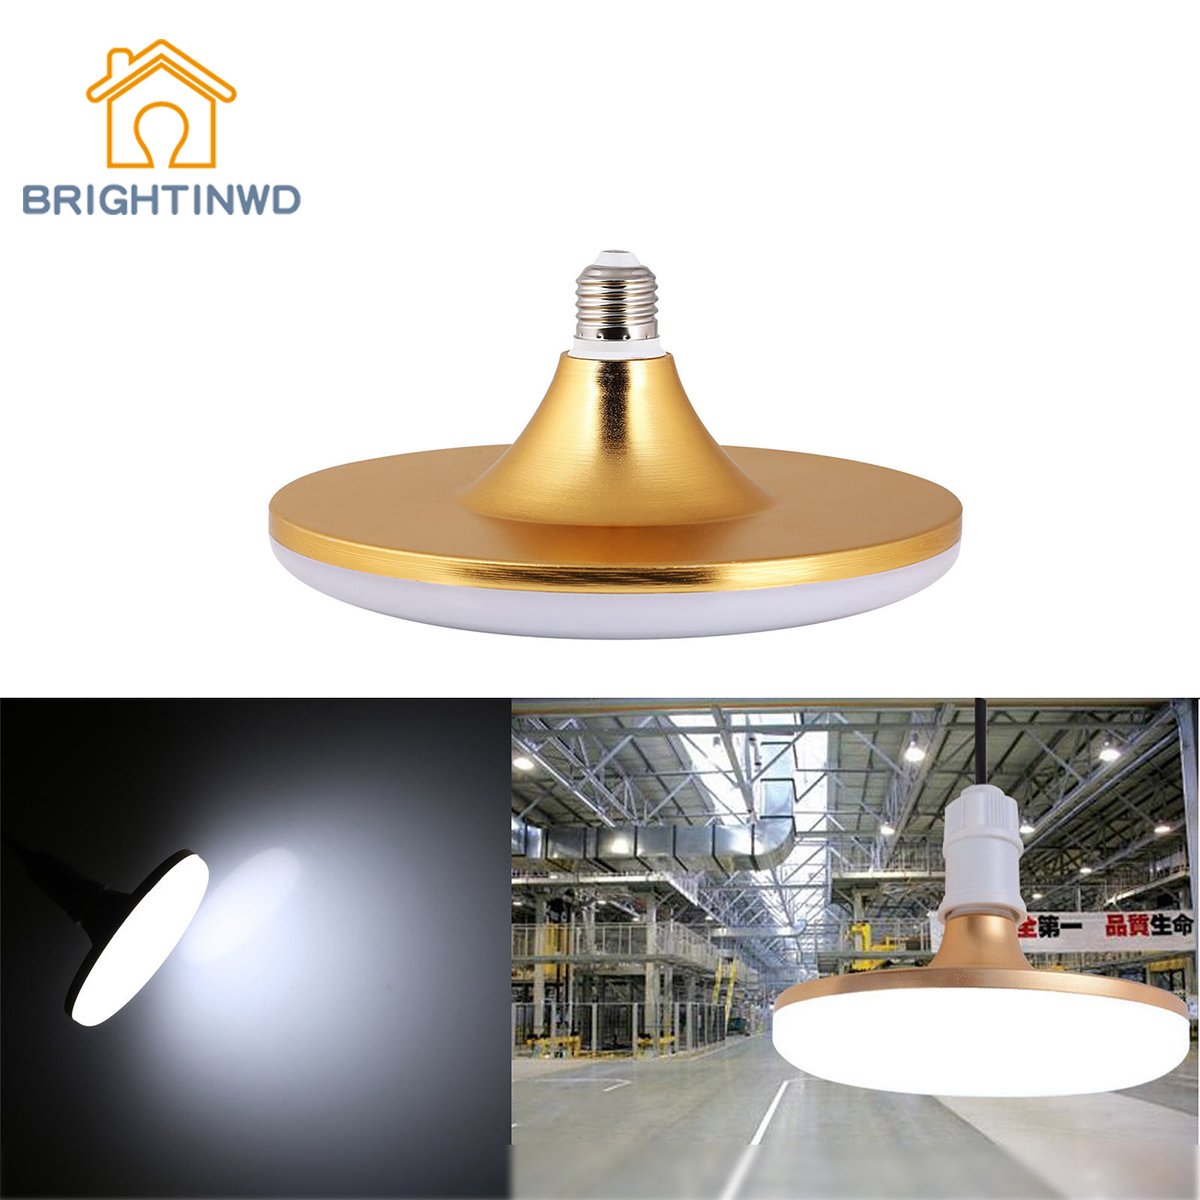 BRIGHTINWD LED Spot Light UFO Globe Round Bulb E27 12W 15W 20W 60W Bright Lamp 220V